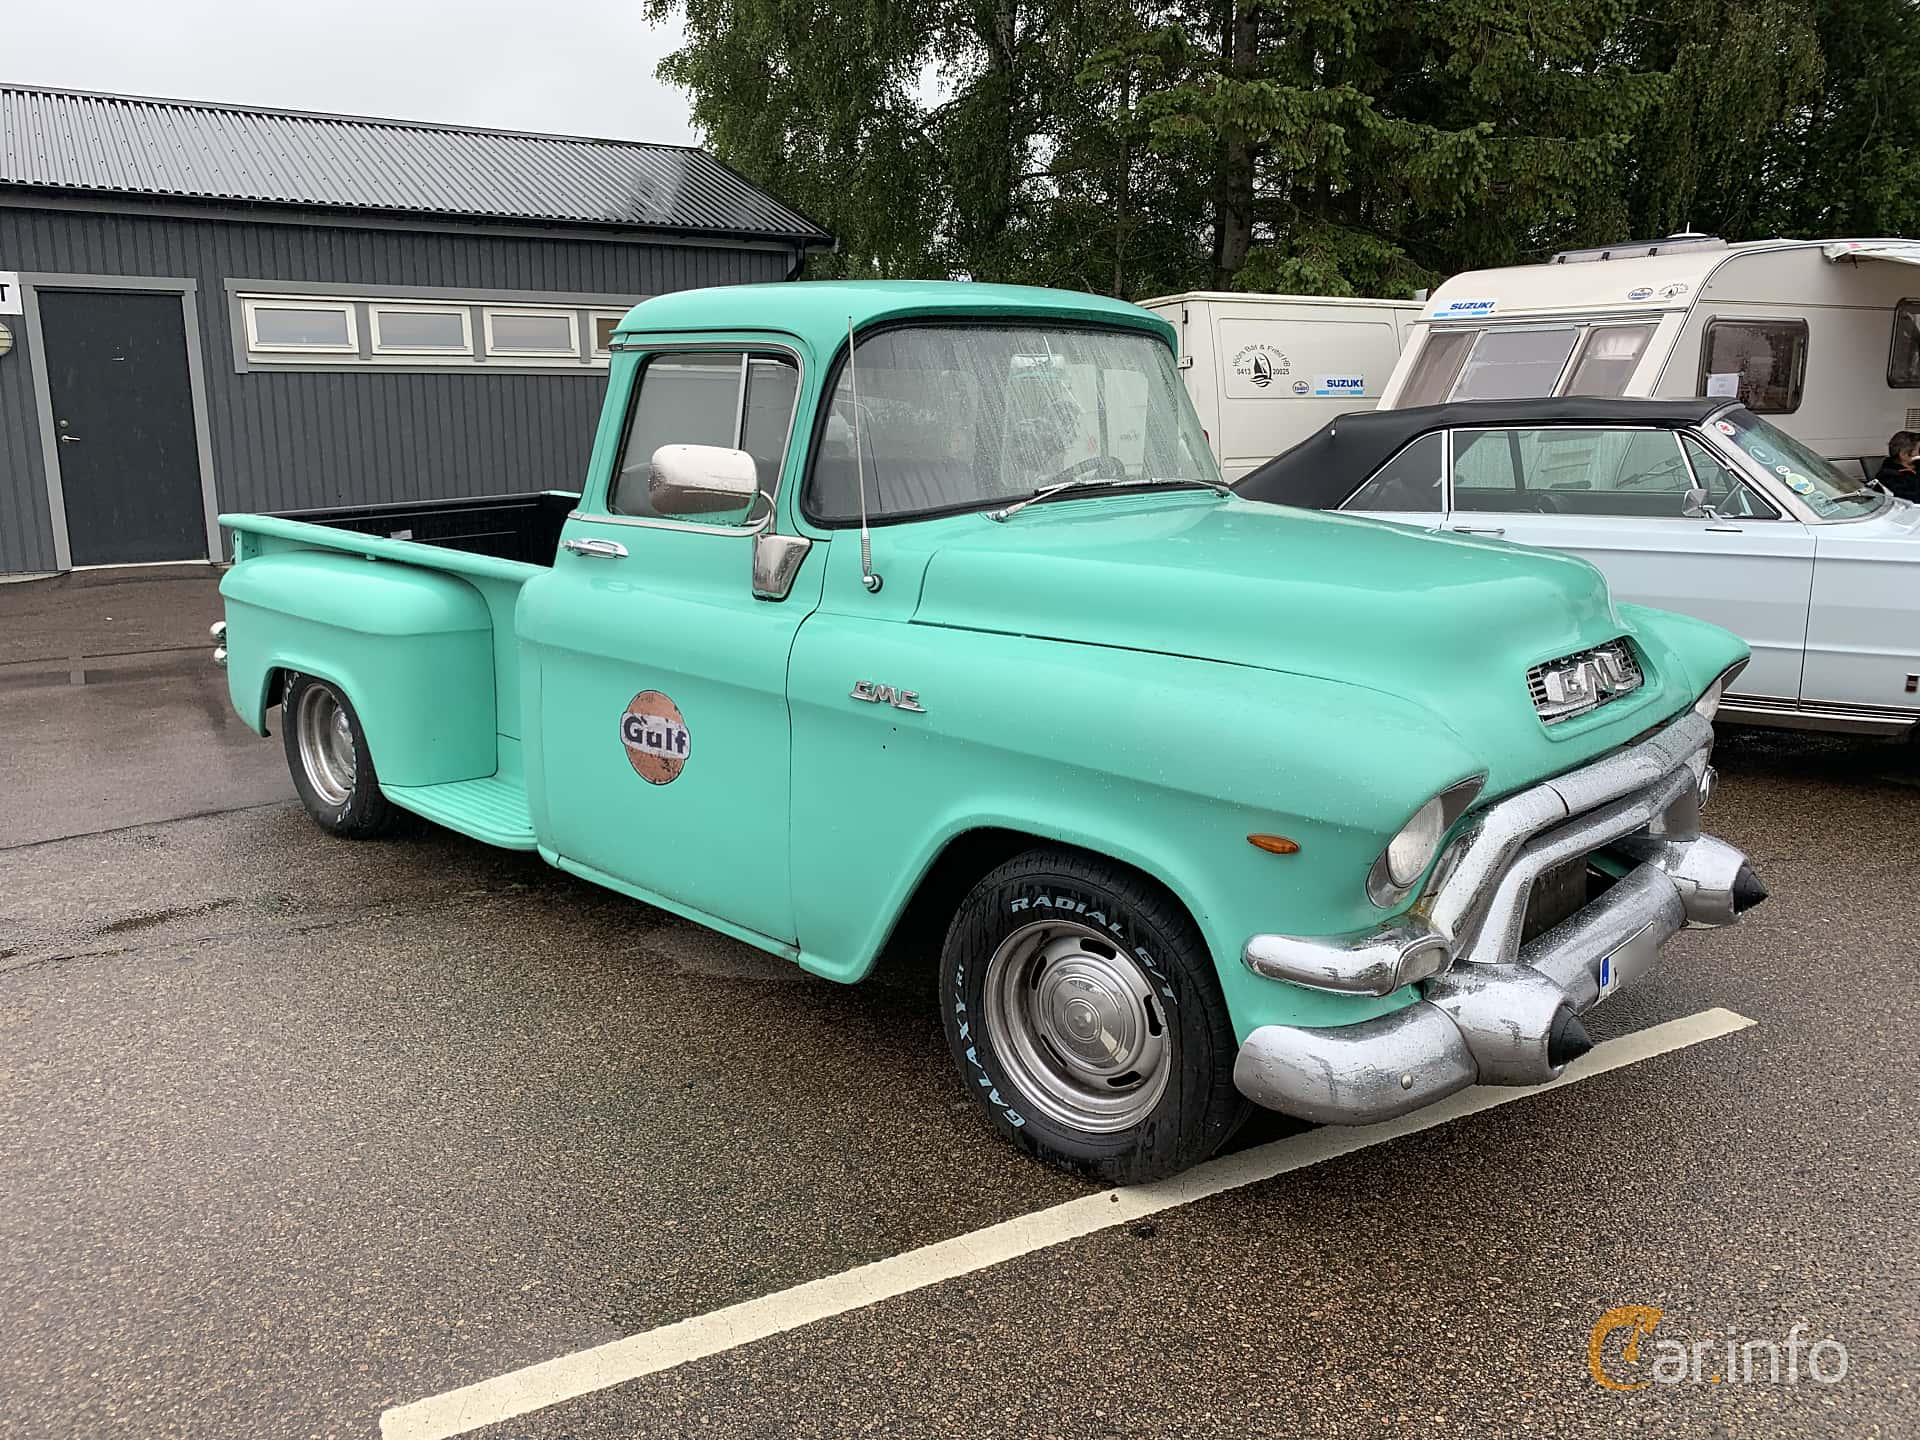 GMC Blue Chip 100 Pickup 5.2 V8 Automatic, 183hp, 1956 at Svenskt sportvagnsmeeting 2019